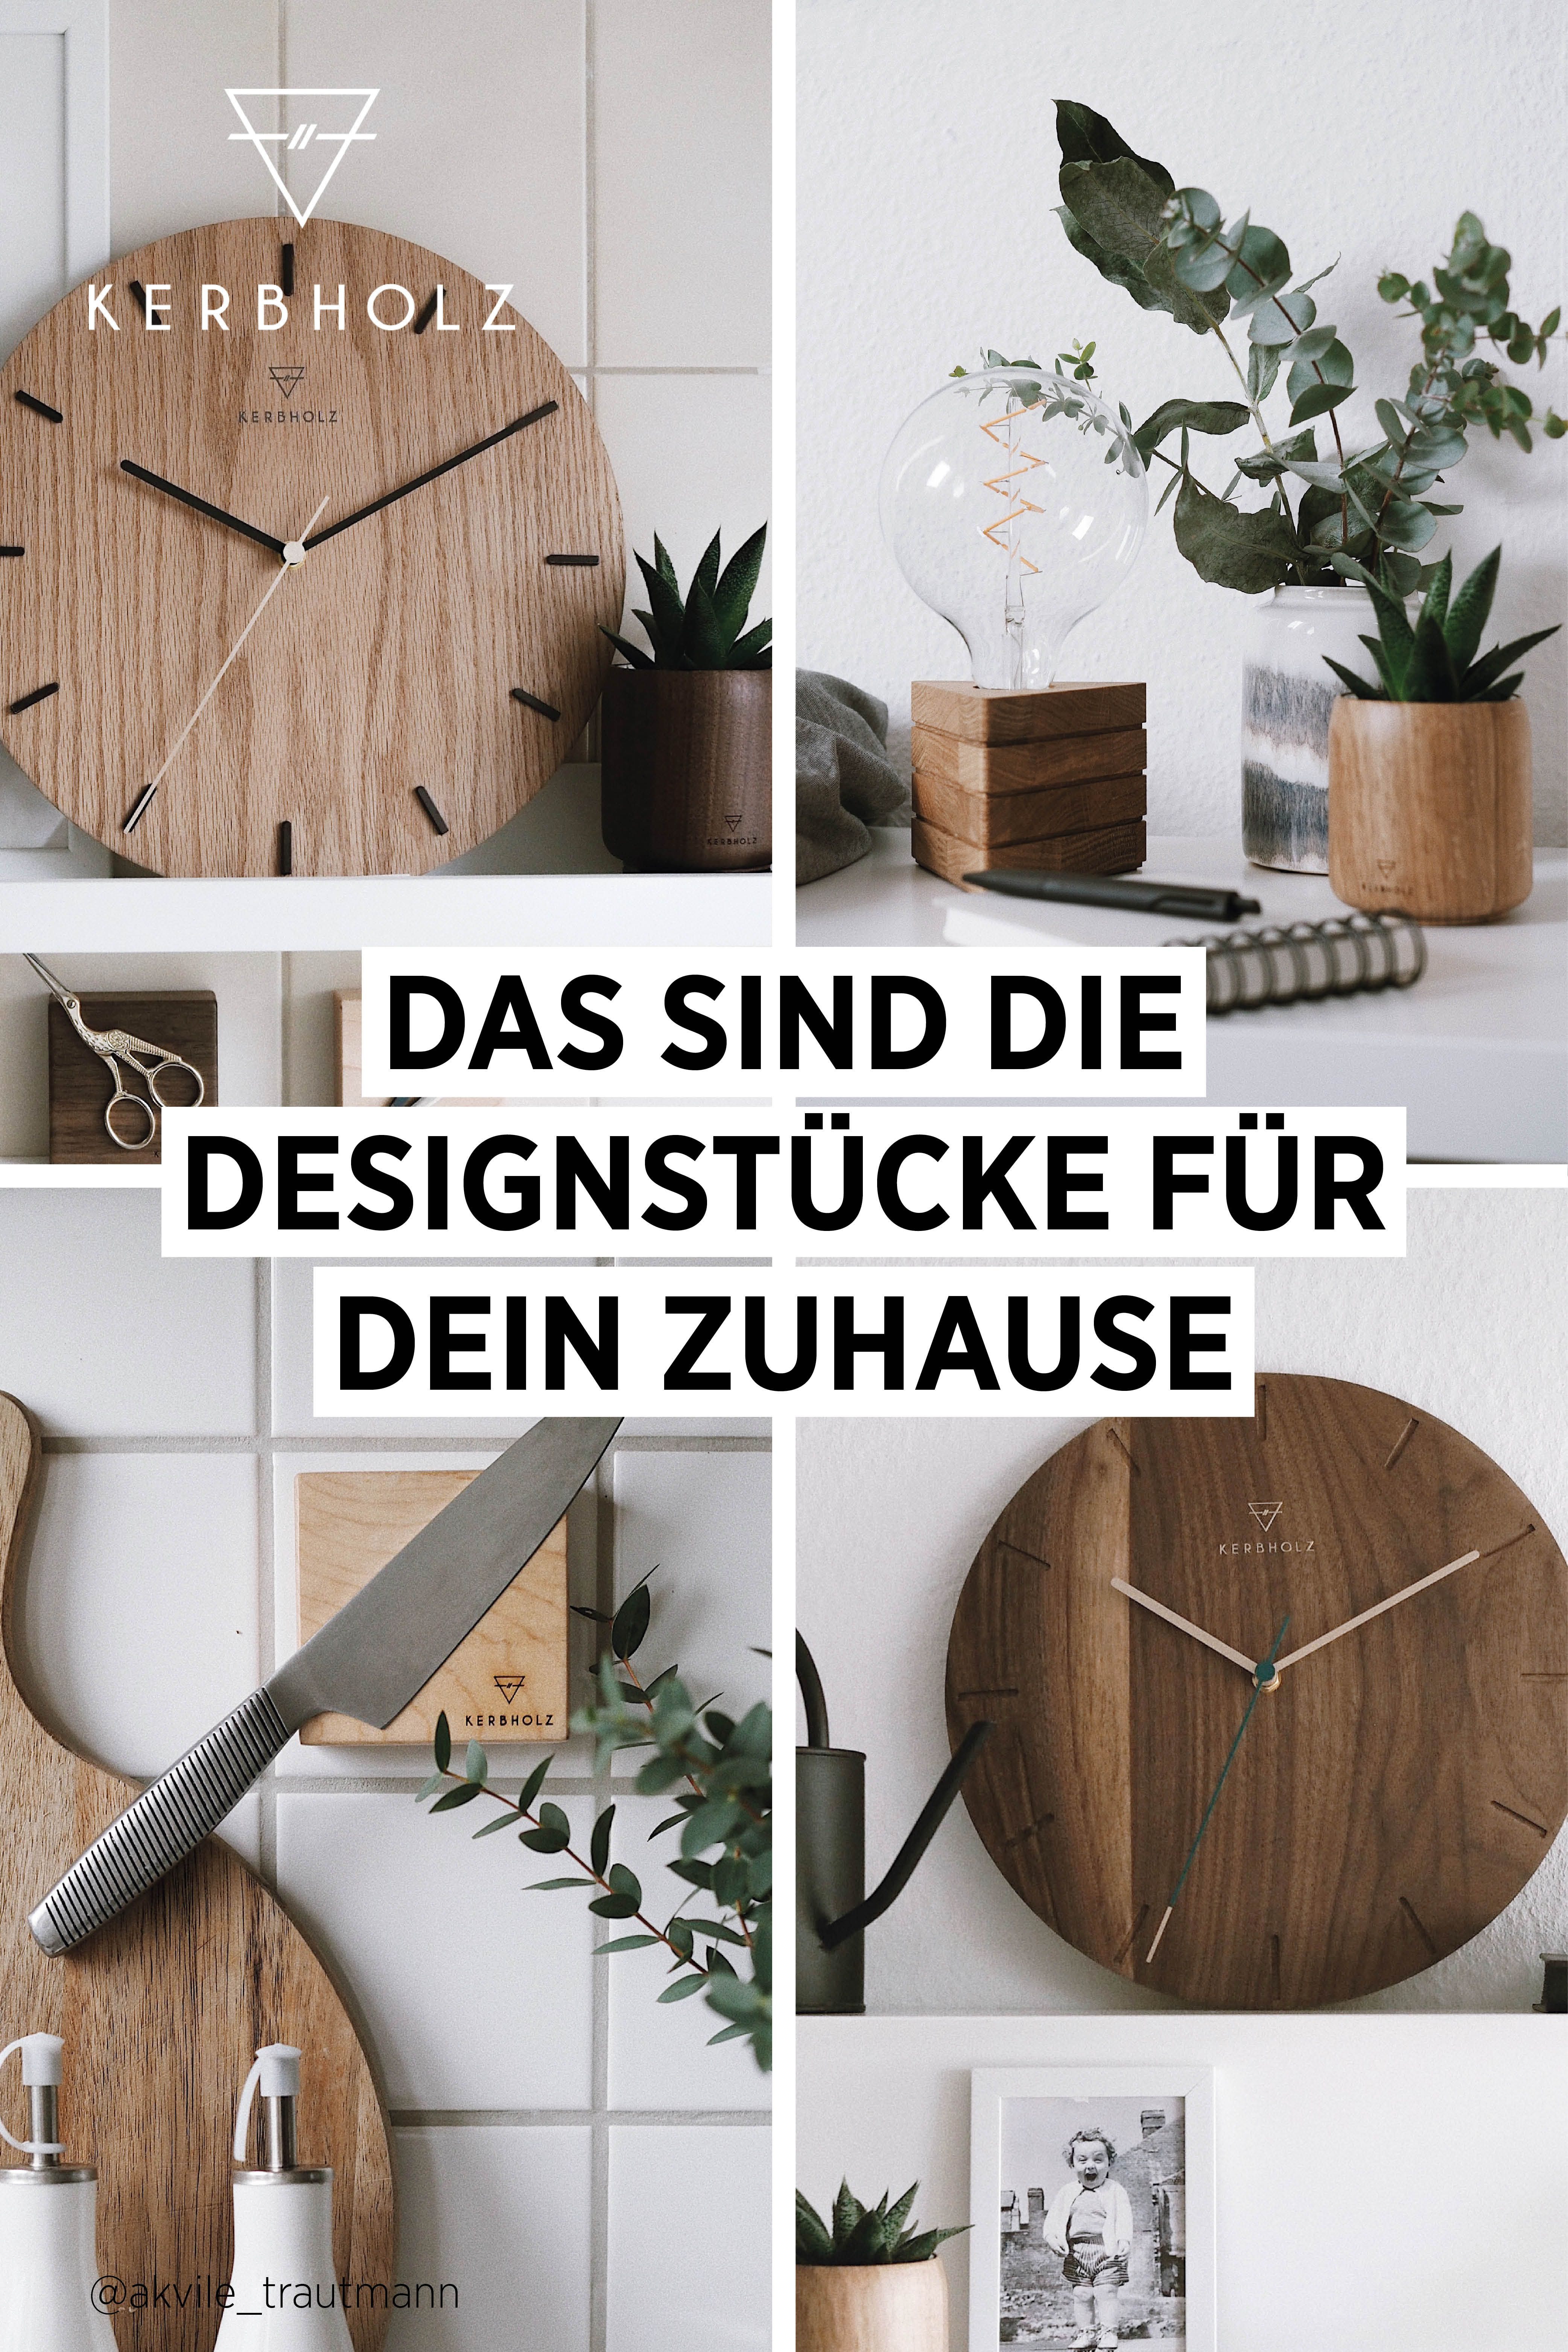 KERBHOLZ | Wohndeko aus Holz